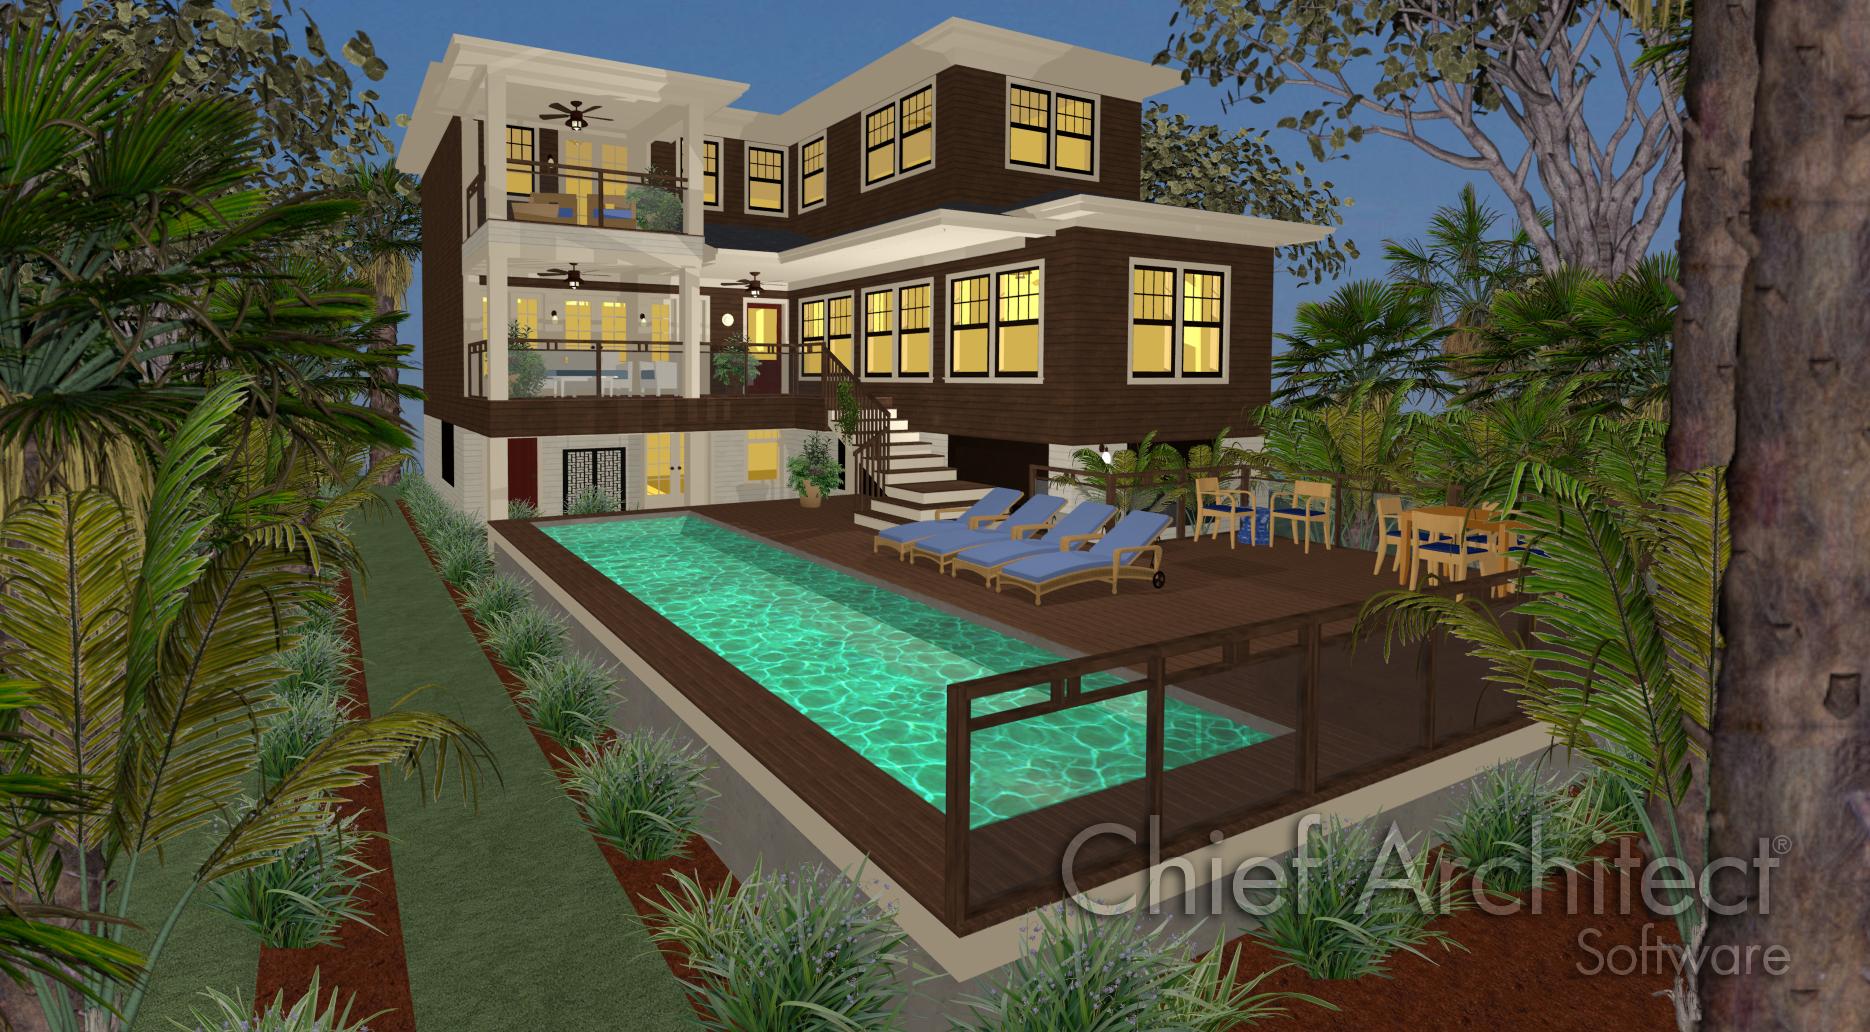 amazon   chief architect home designer suite 2018   dvd